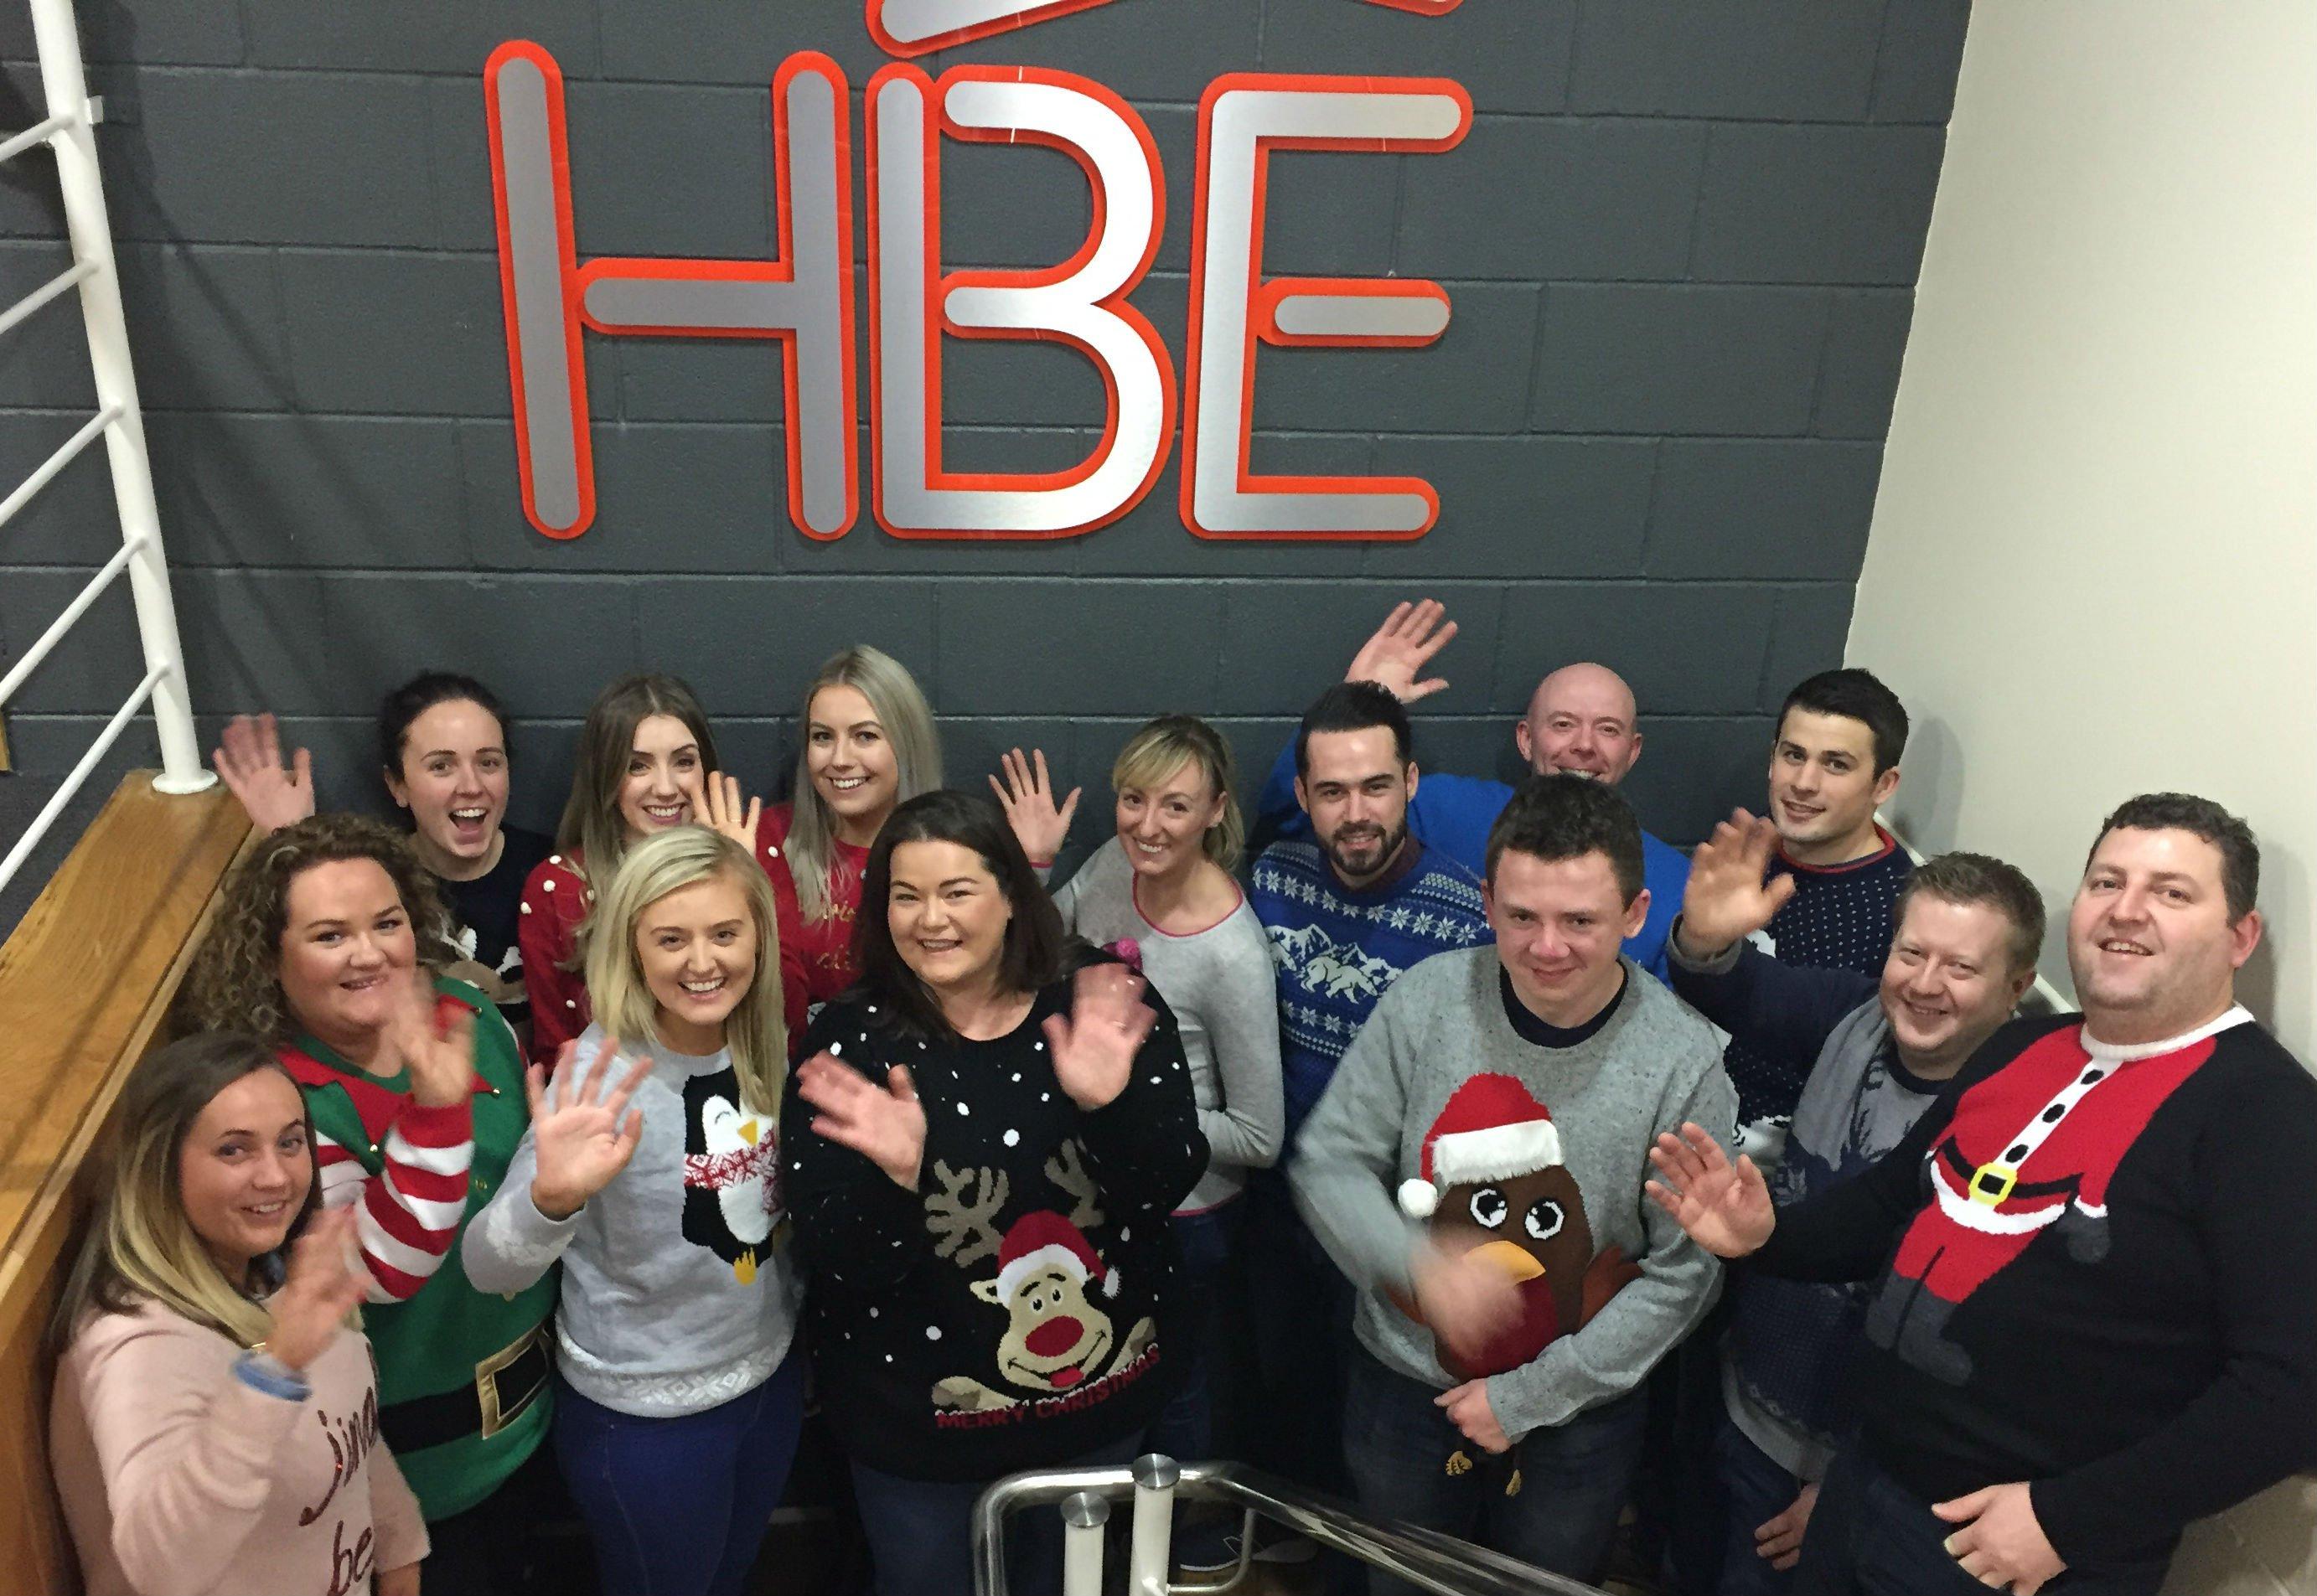 HBE Fun Friday Charity fundraising day